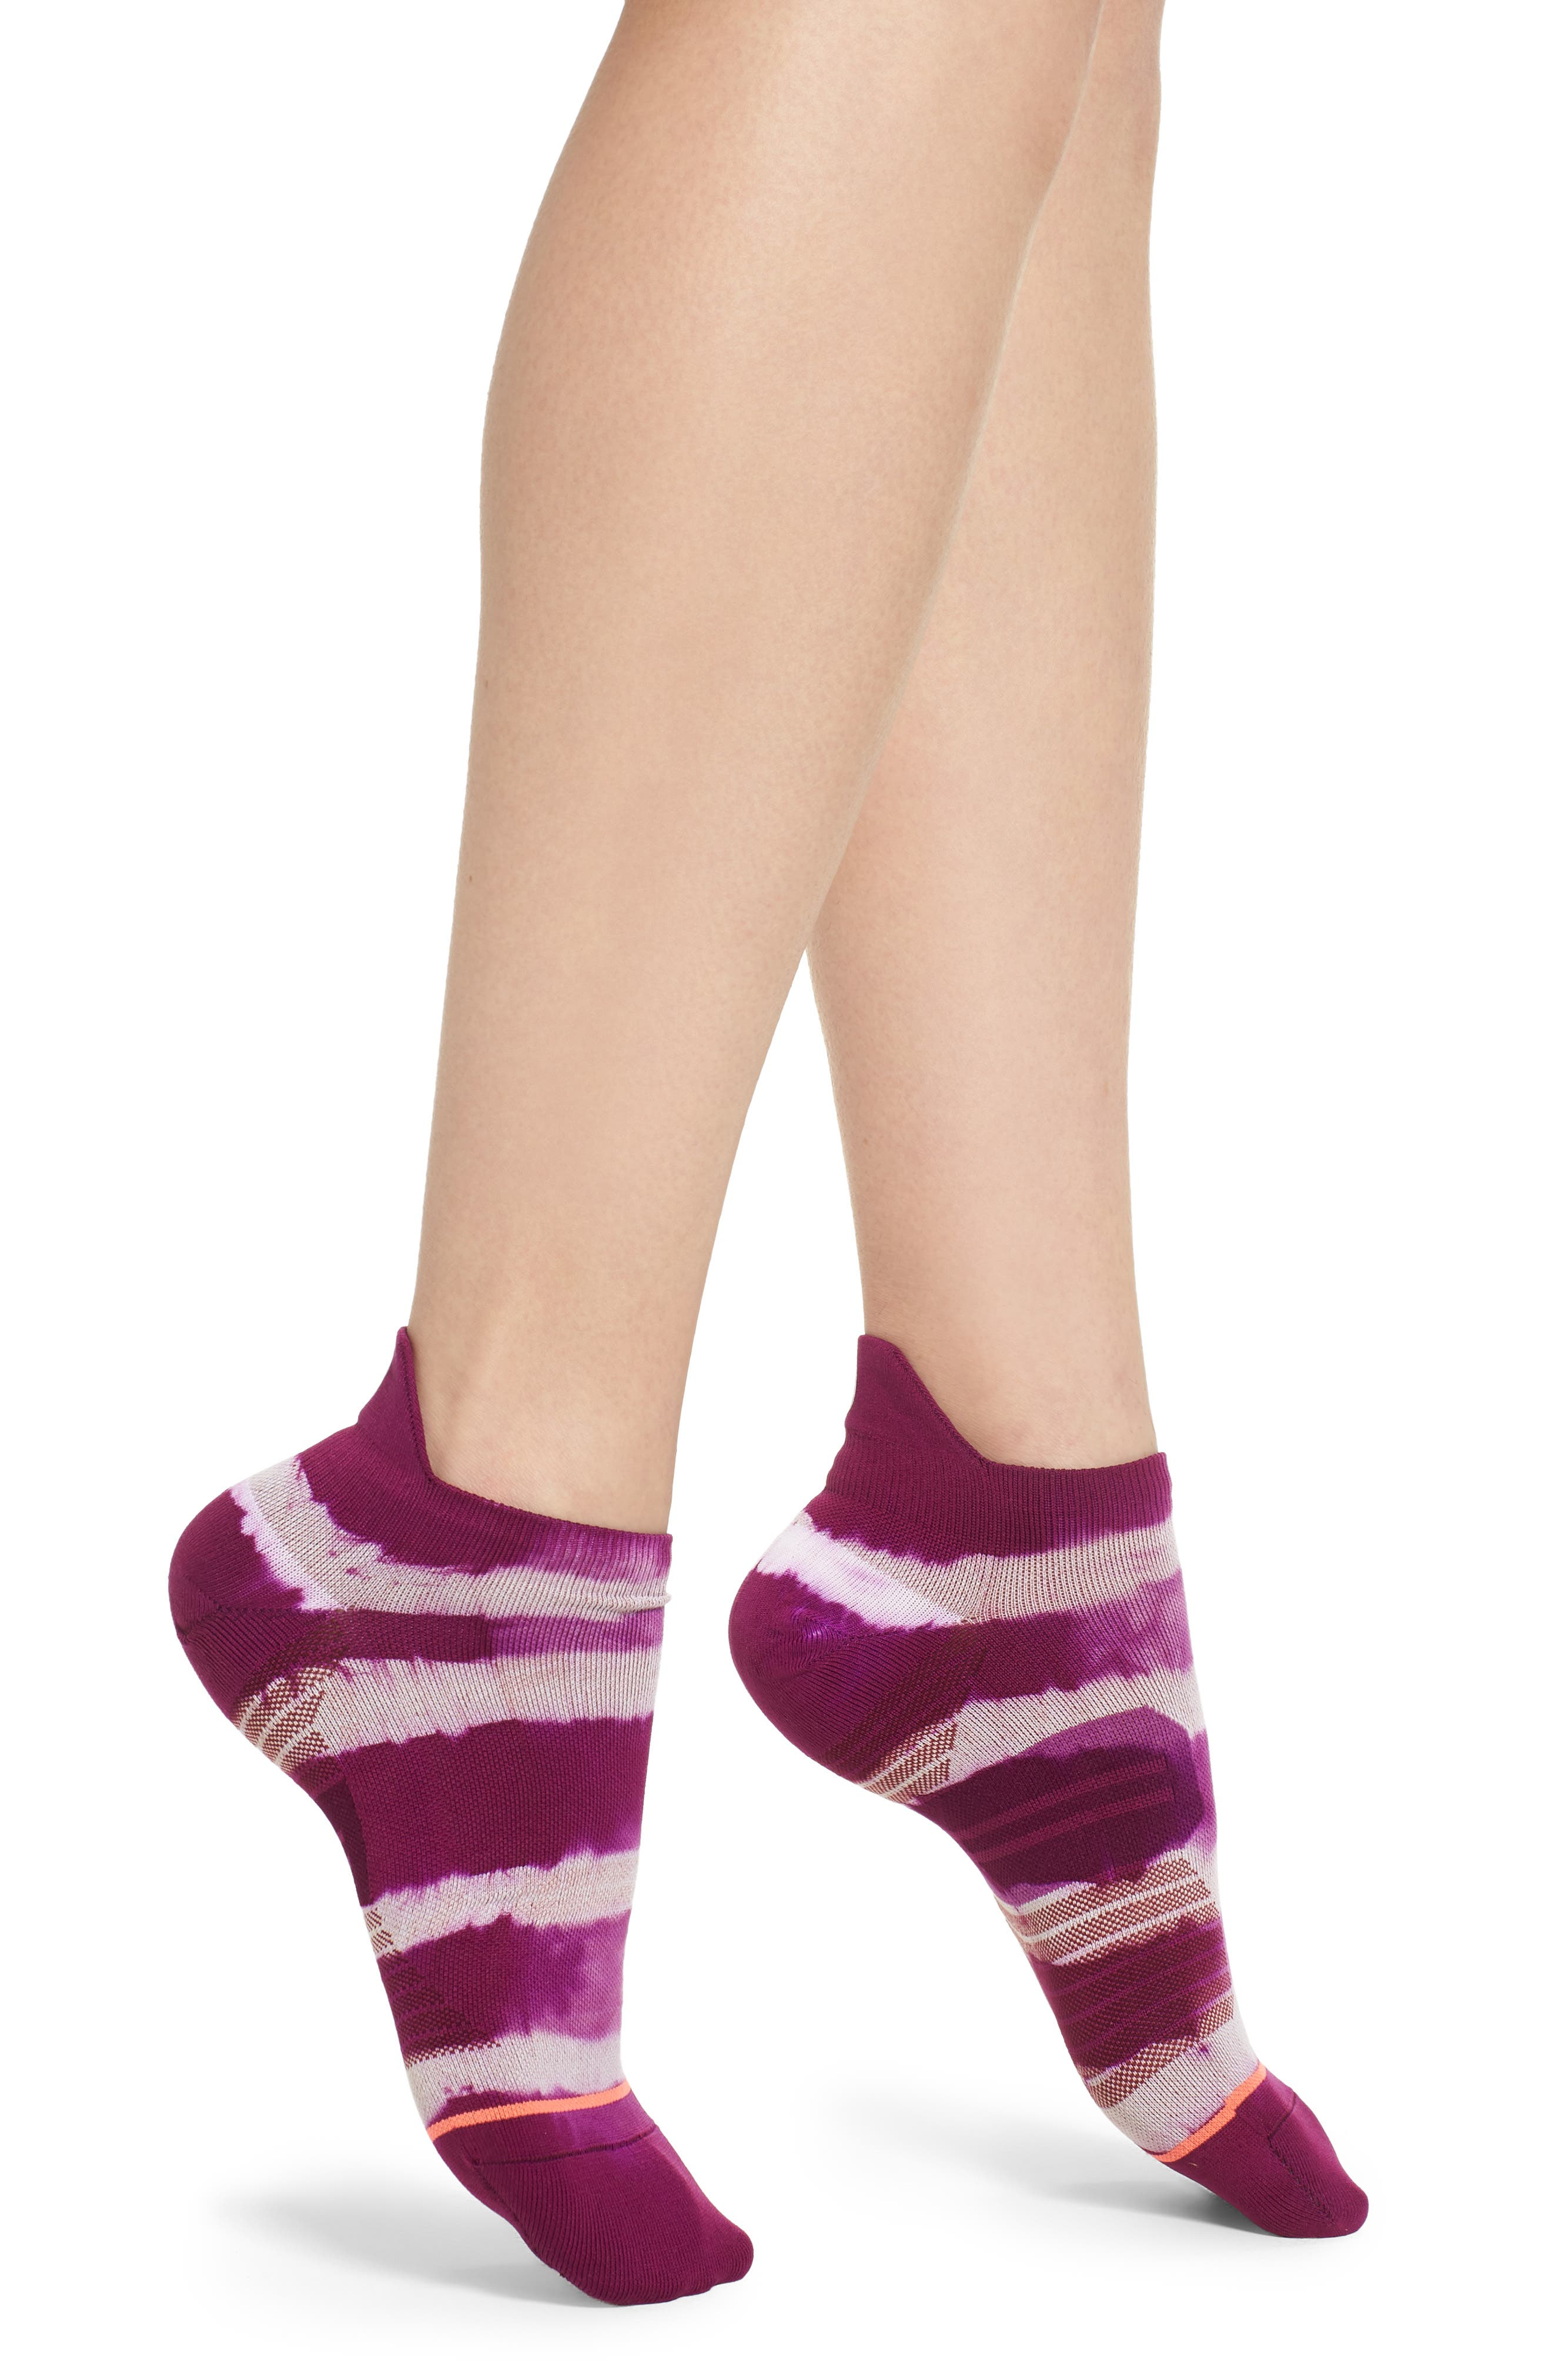 Downhill Tab Running Socks,                         Main,                         color, Purple